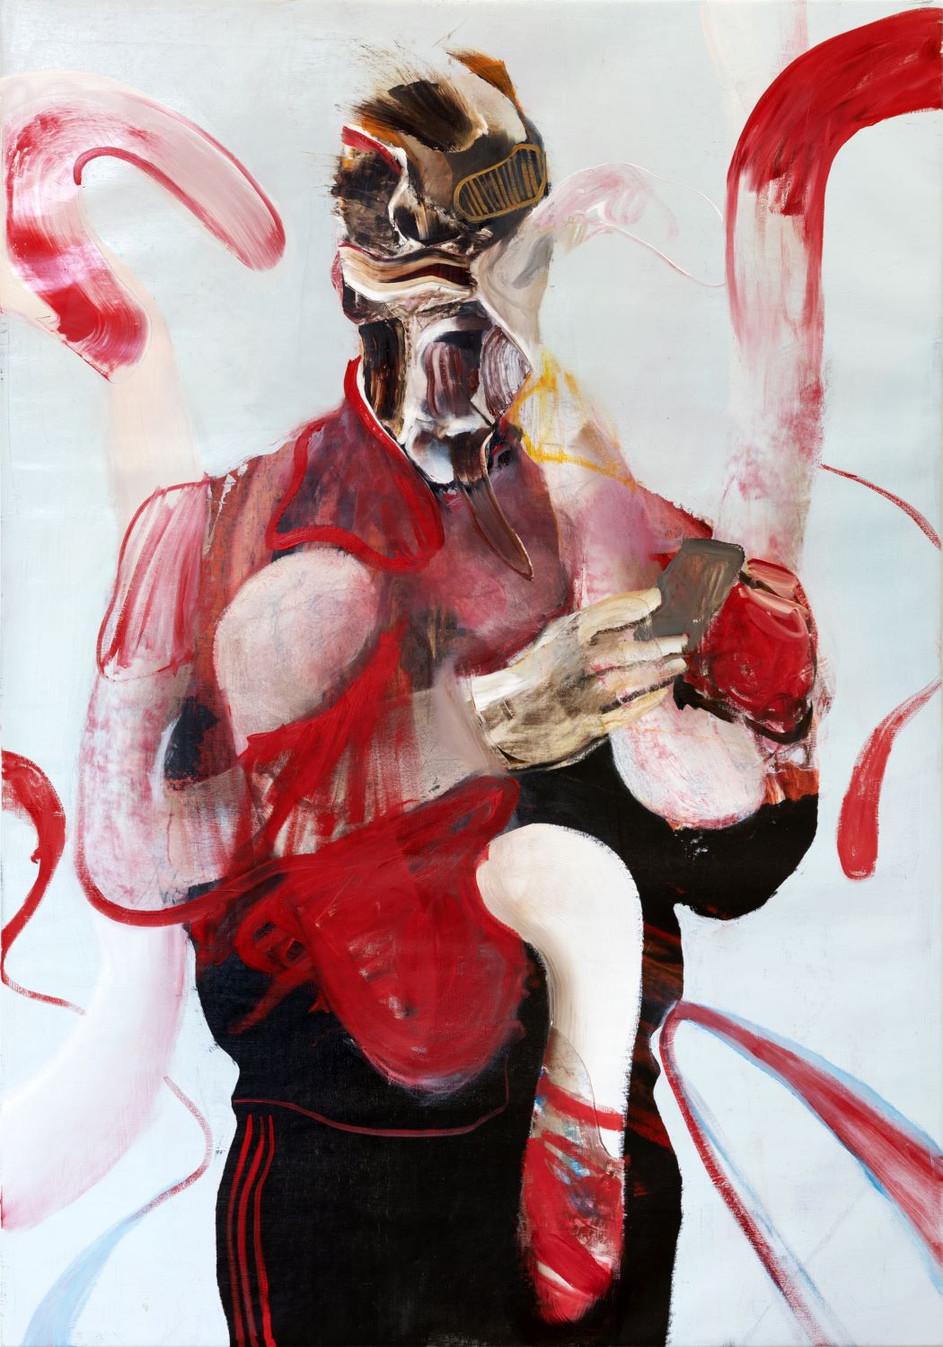 ADRIAN GHENIE Self-Portrait with iPhone 2, 2019 oil on canvas 160 x 110 cm